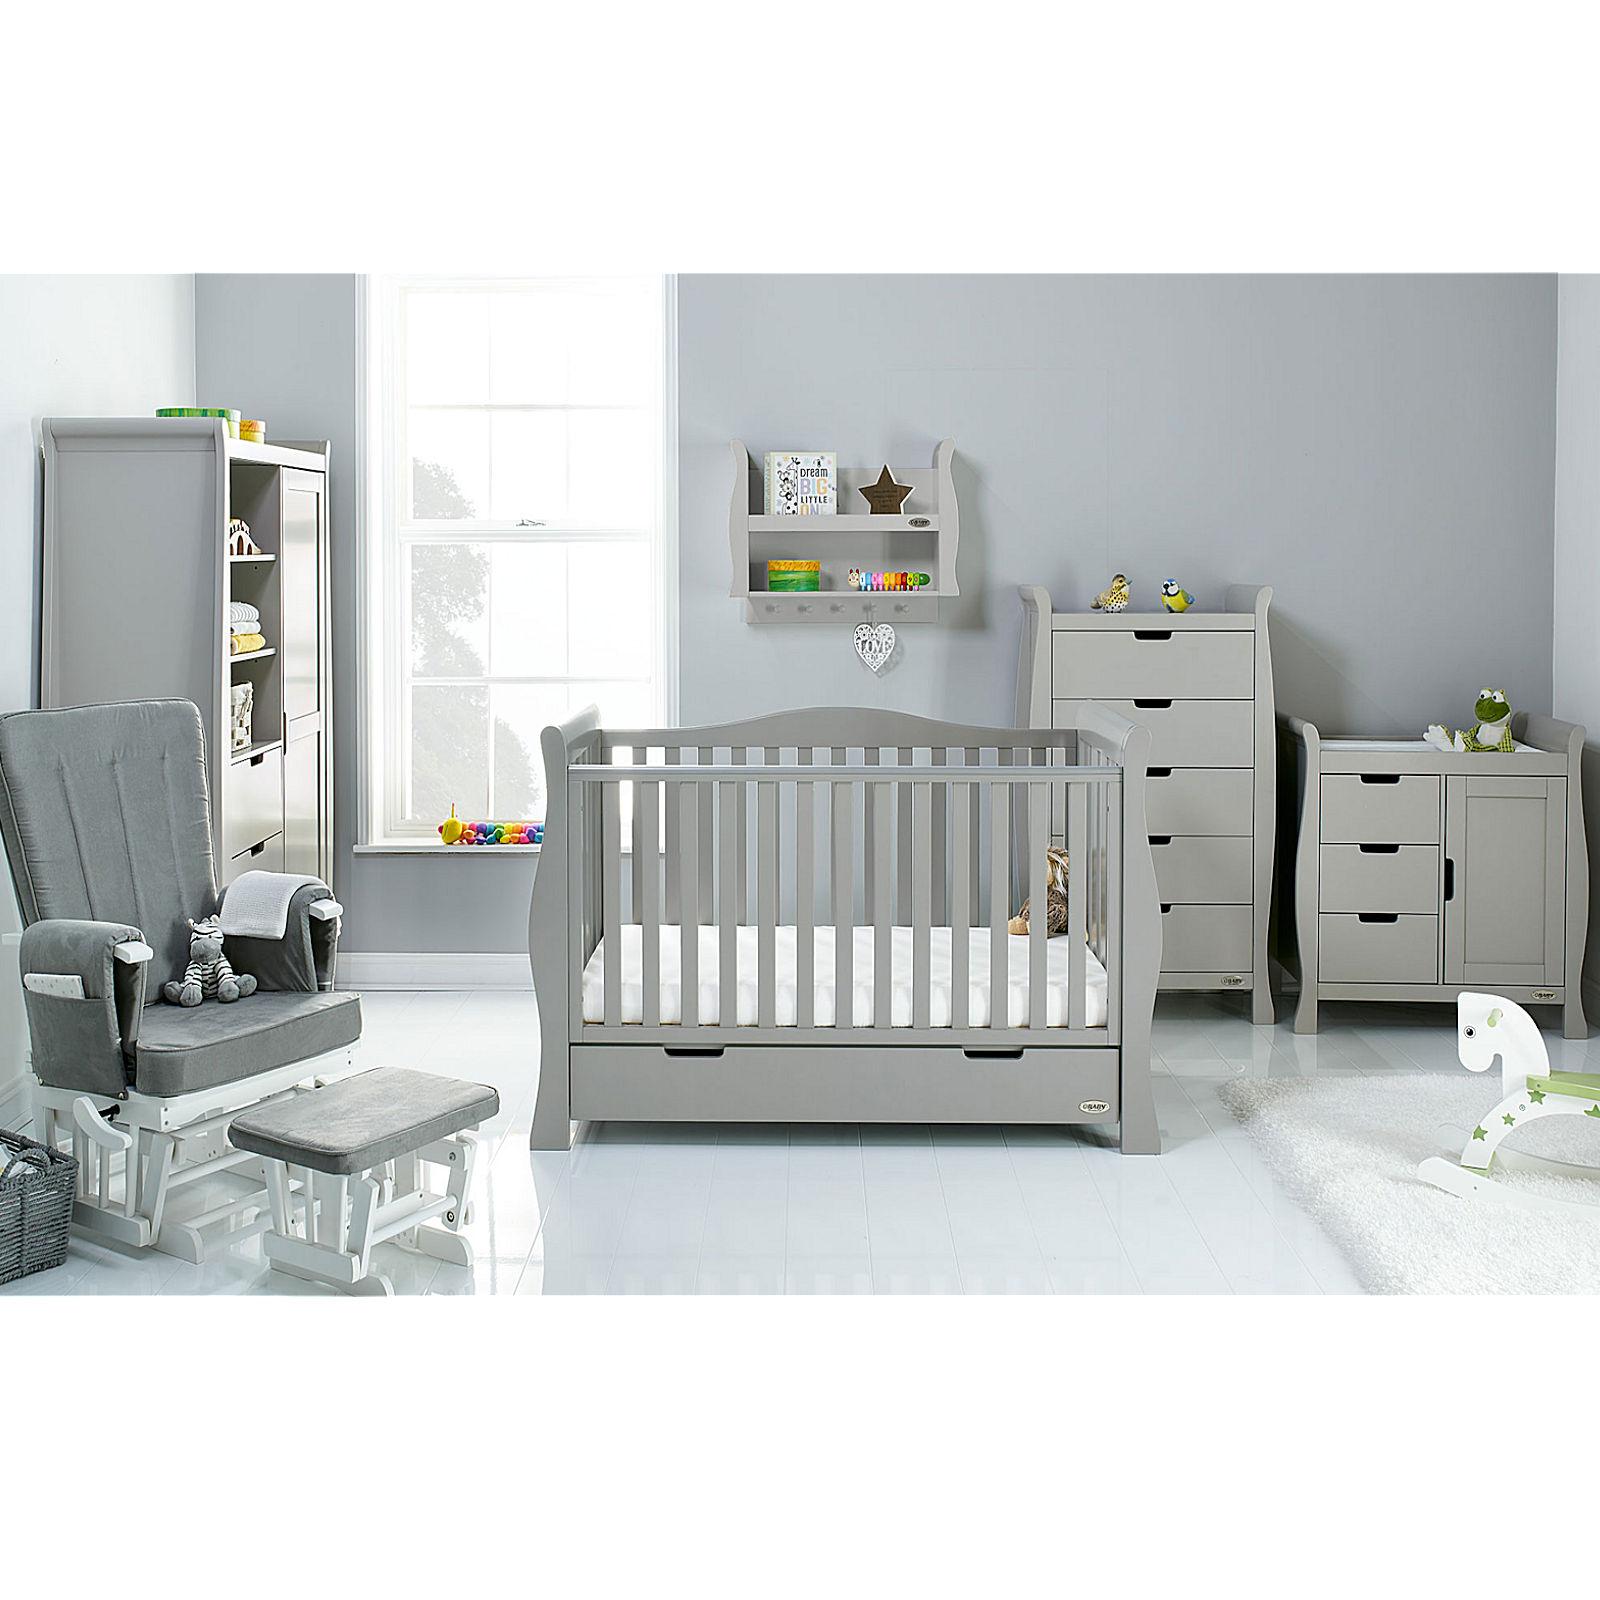 c6a915b7f742 Obaby Stamford Luxe Sleigh 5 Piece Nursery Room Set - Warm Grey ...